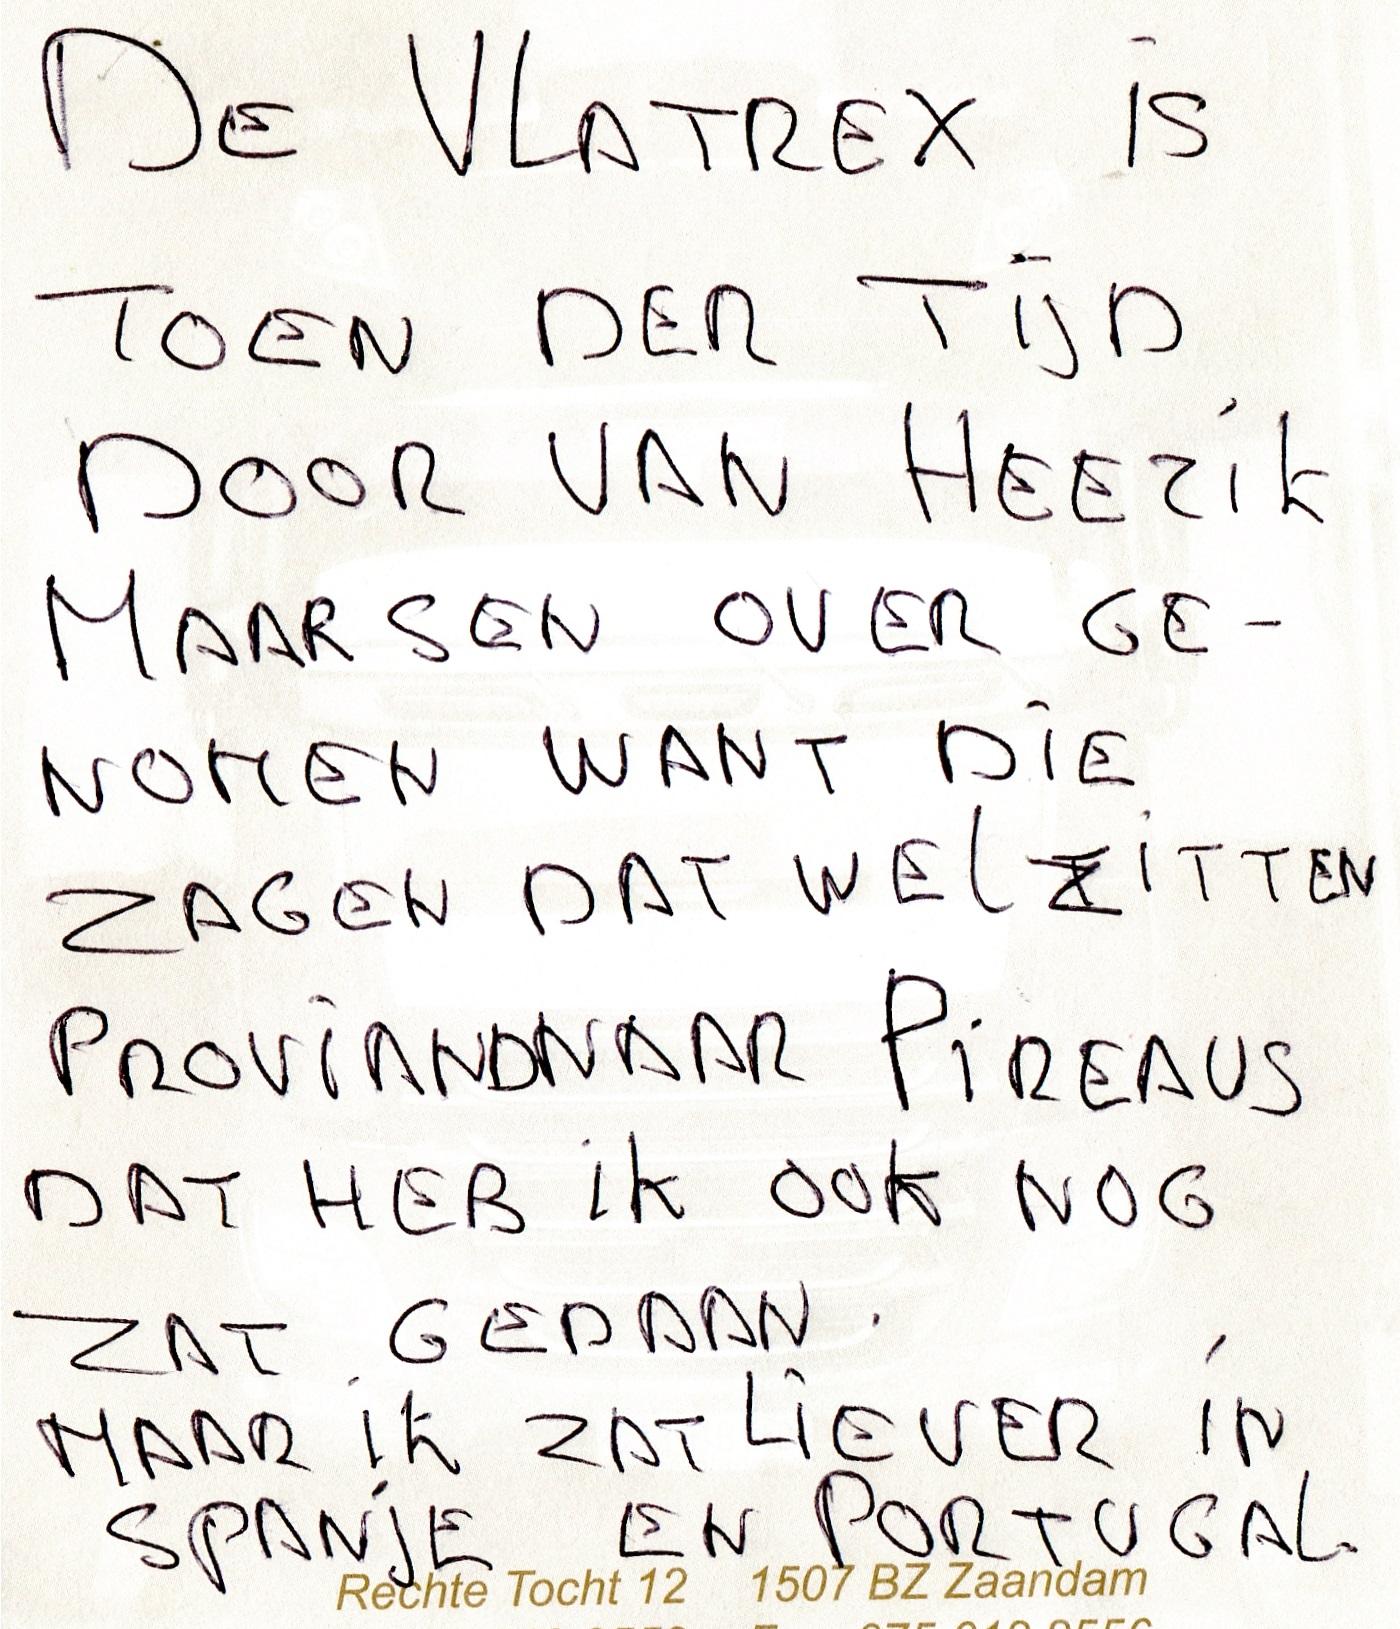 Vlatrex-1